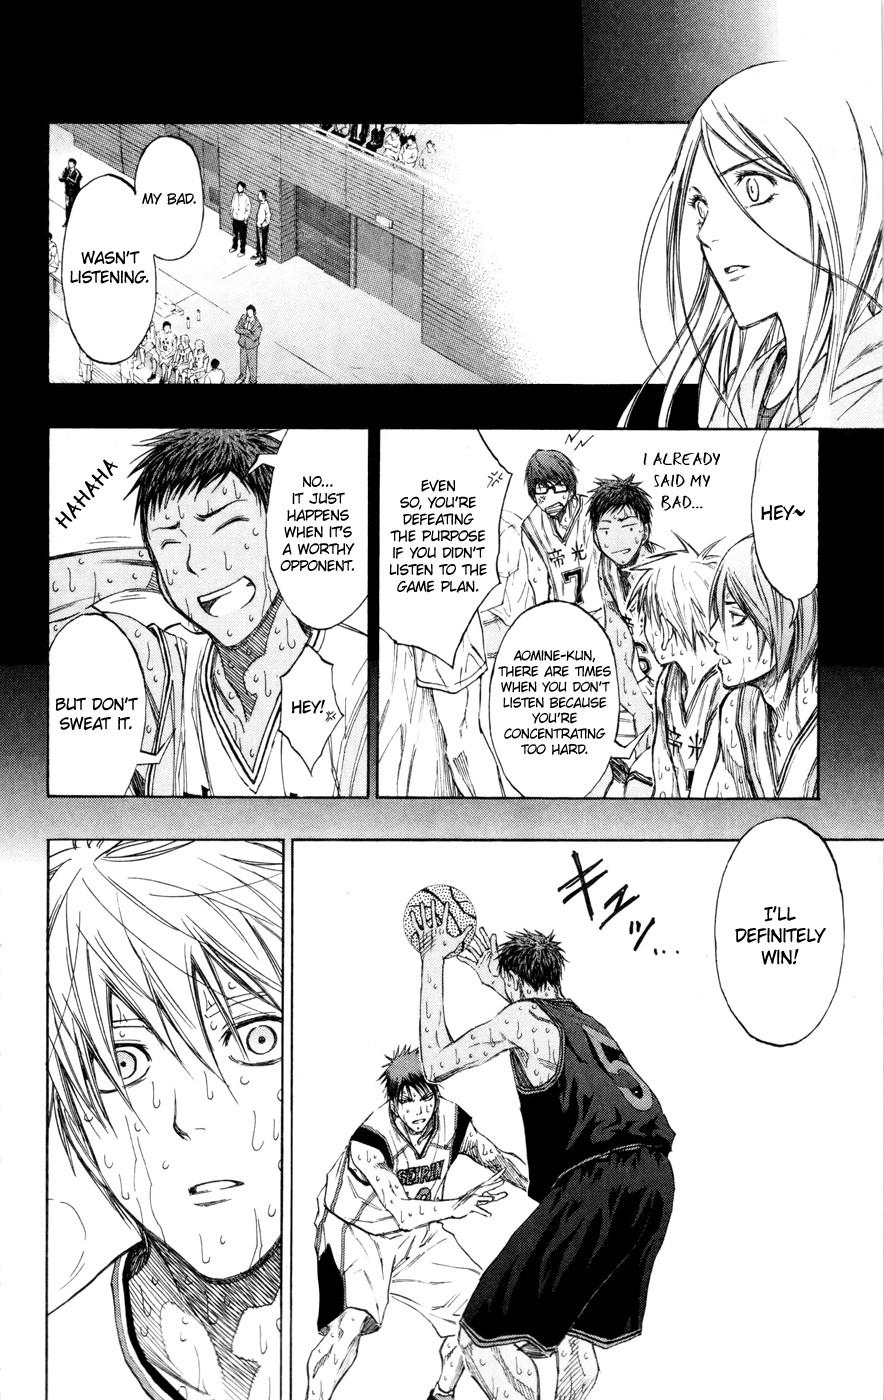 Kuroko no Basket Manga Chapter 130 - Image 17